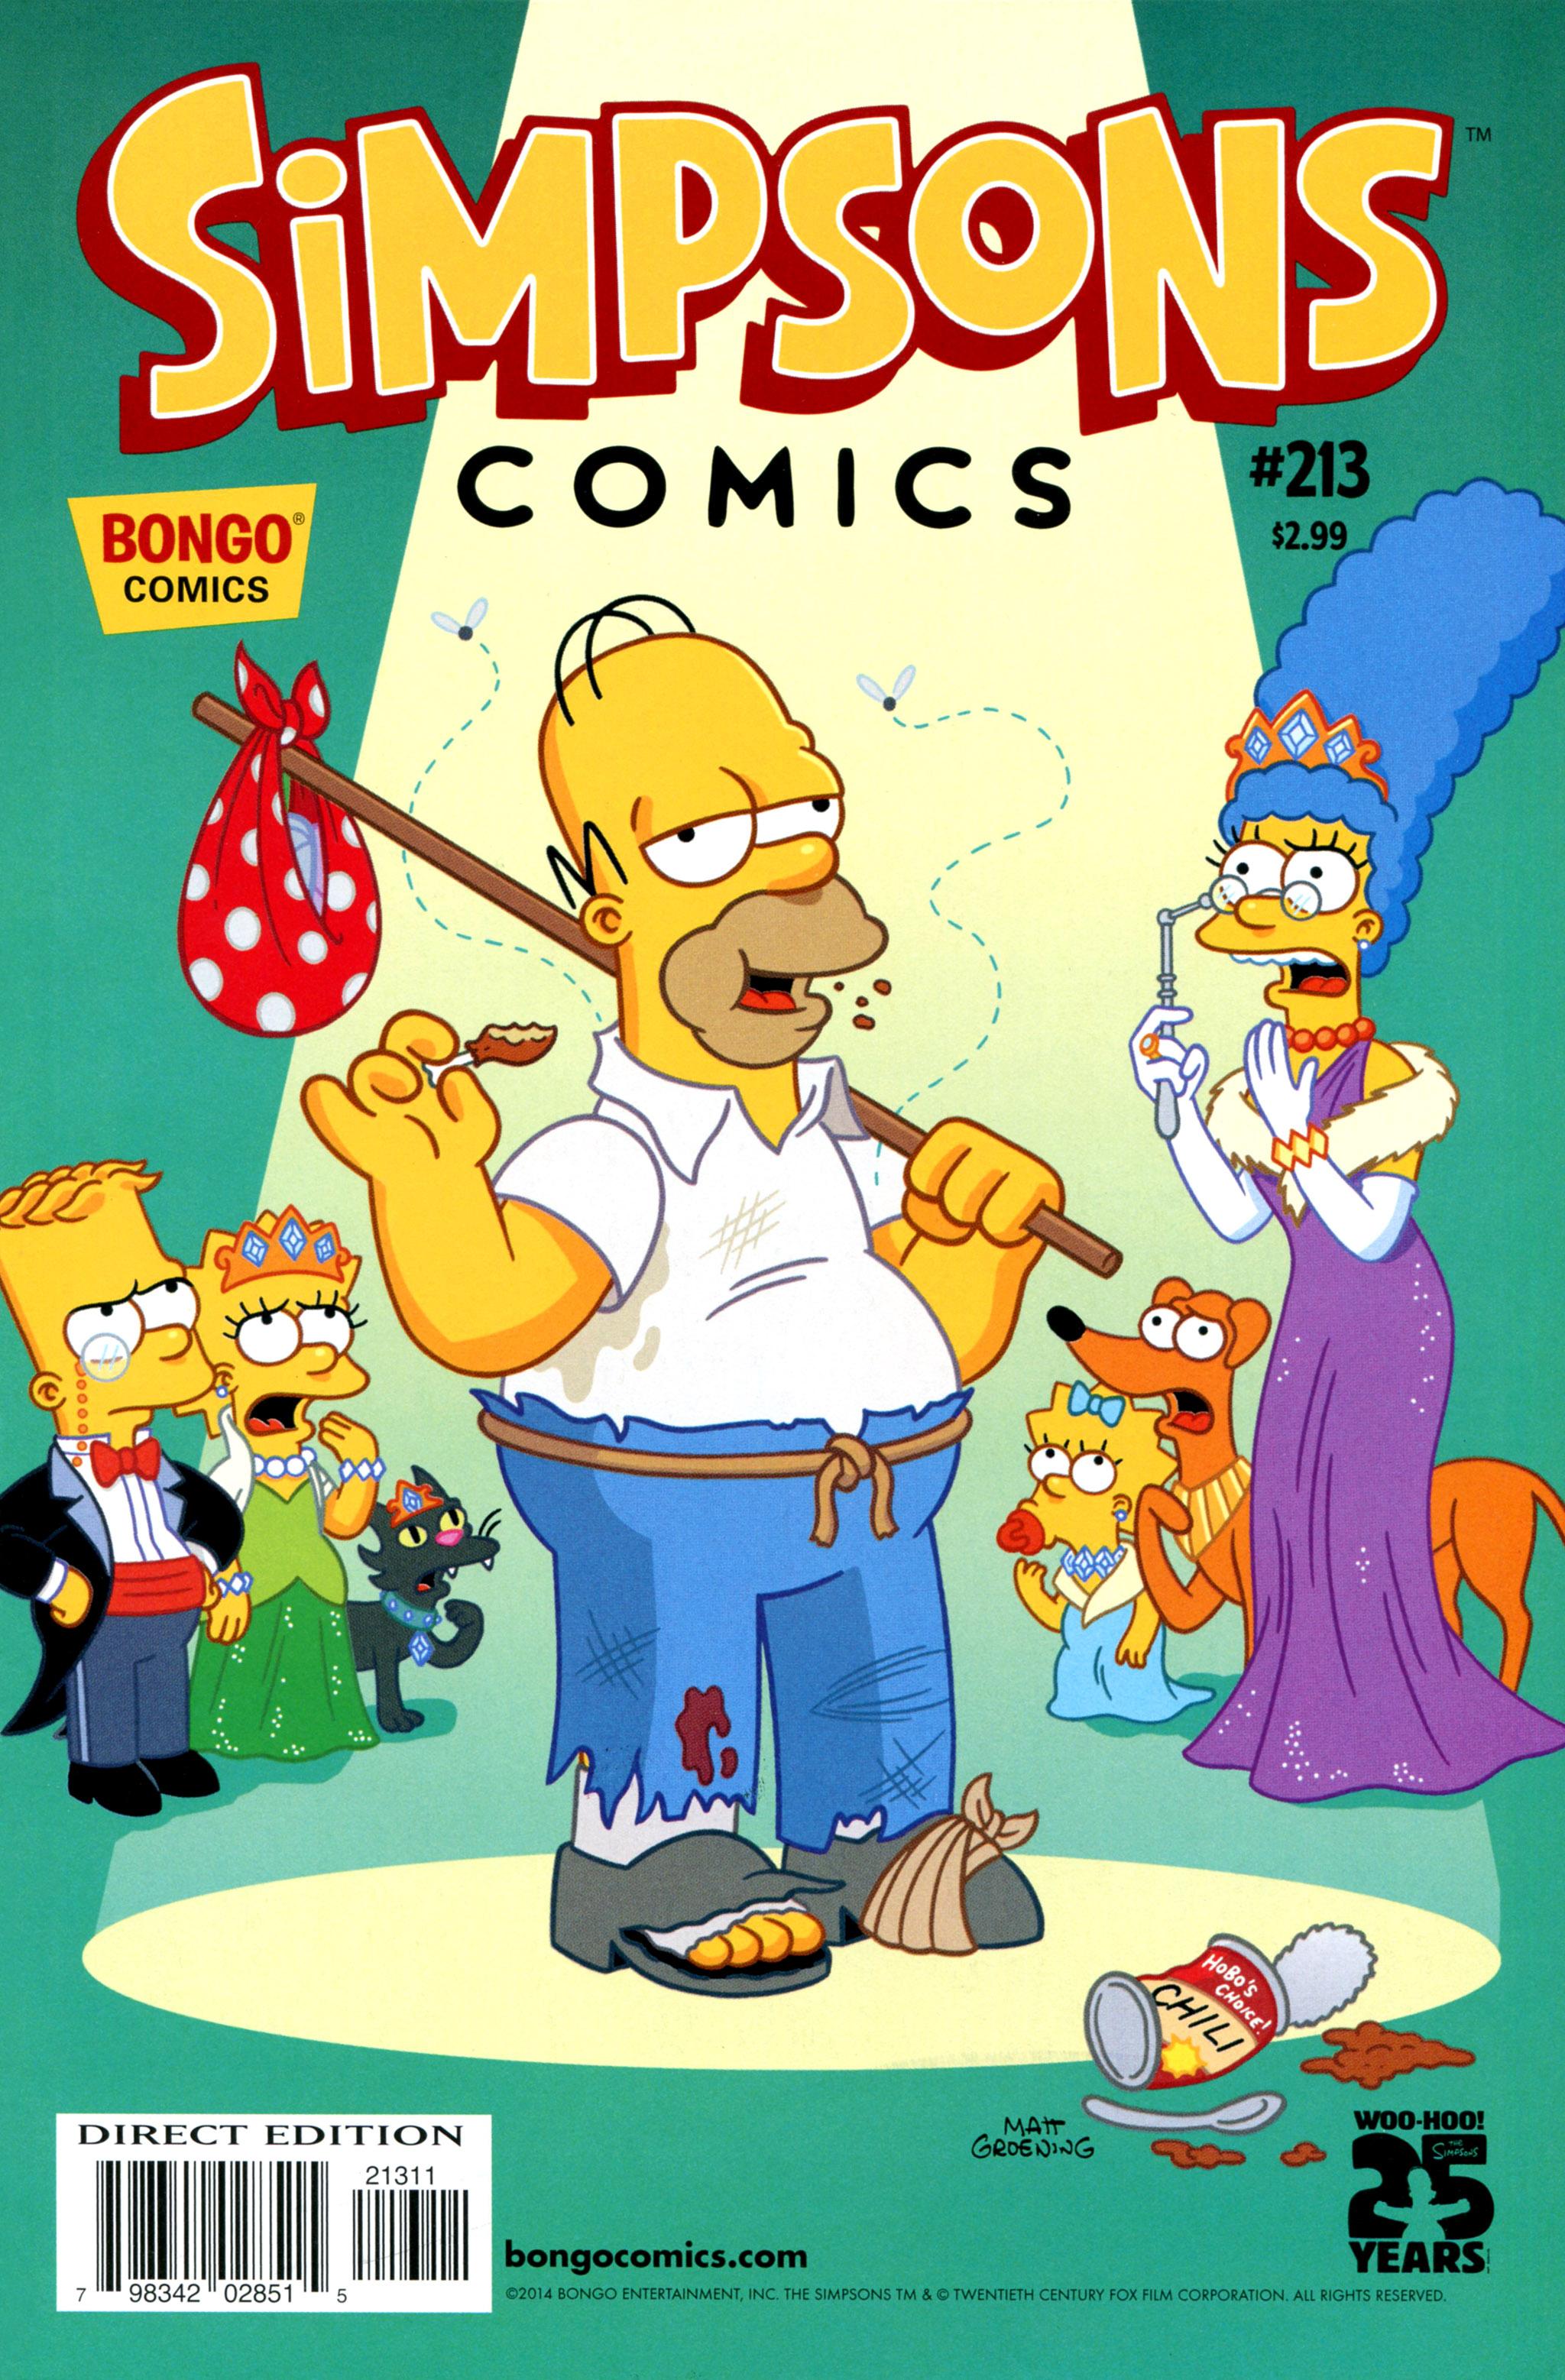 Simpsons Comics 213 Page 1